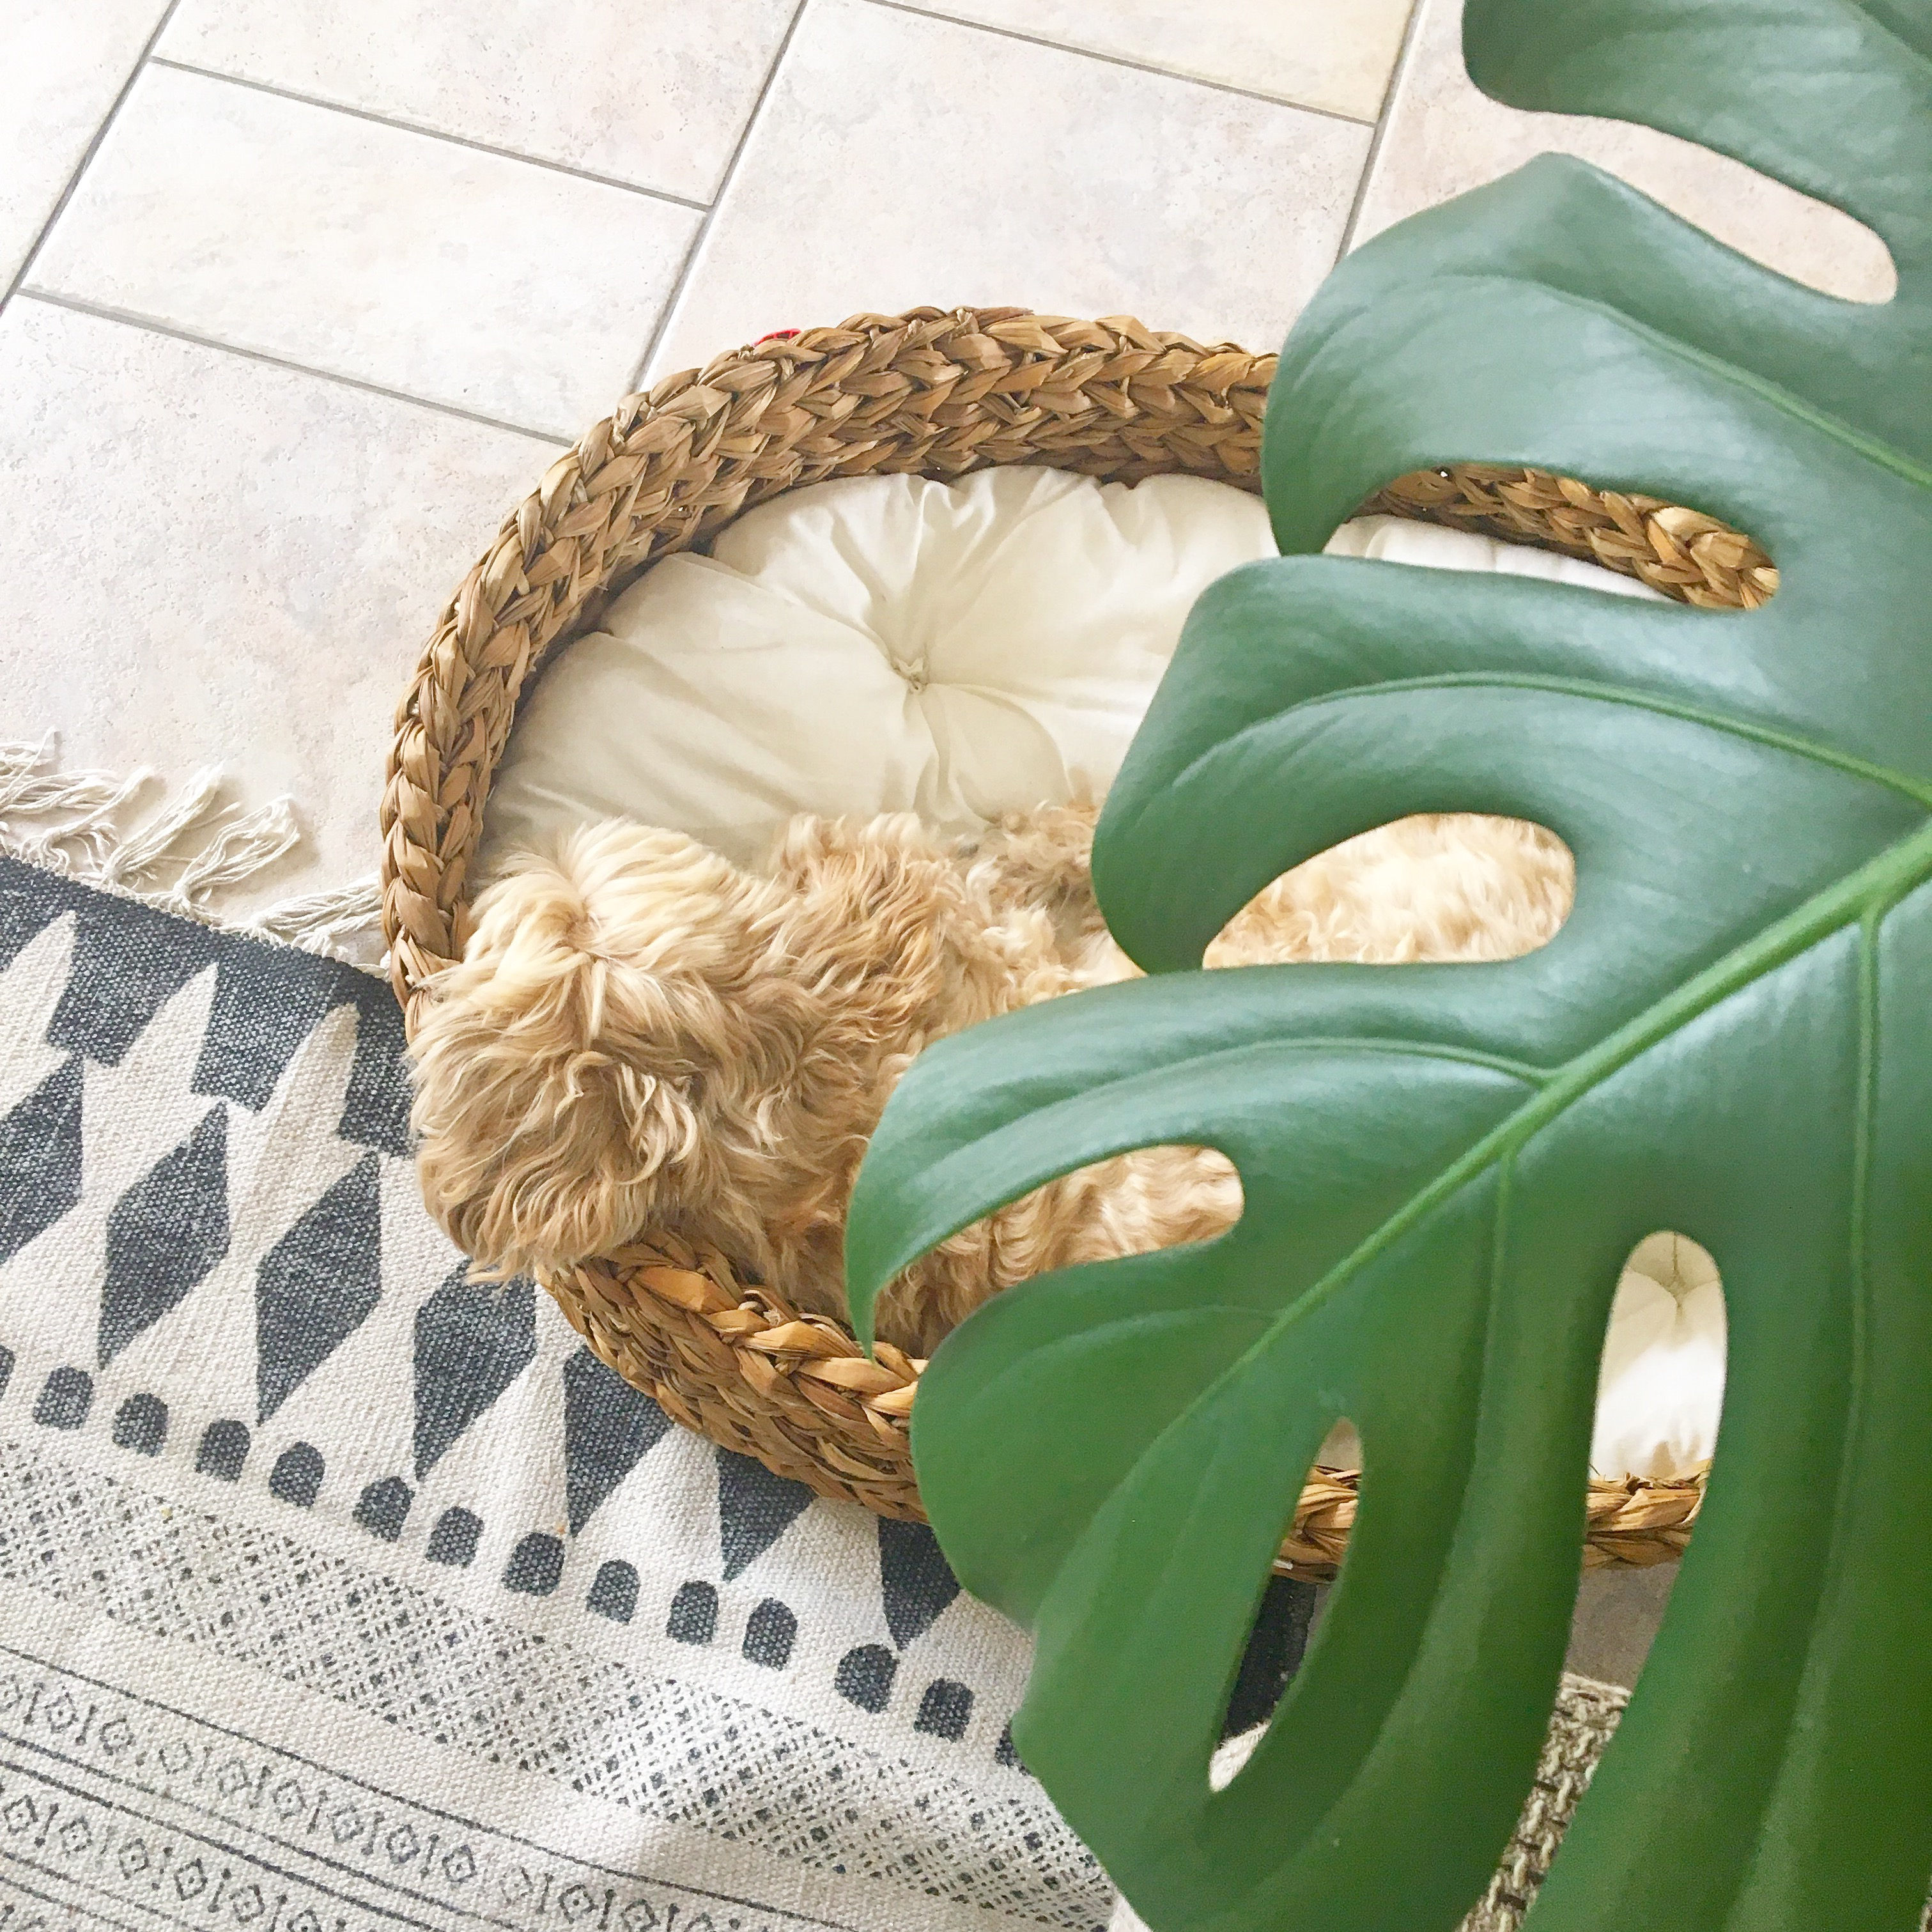 hondenmand yoshiko mandenhuys gangni